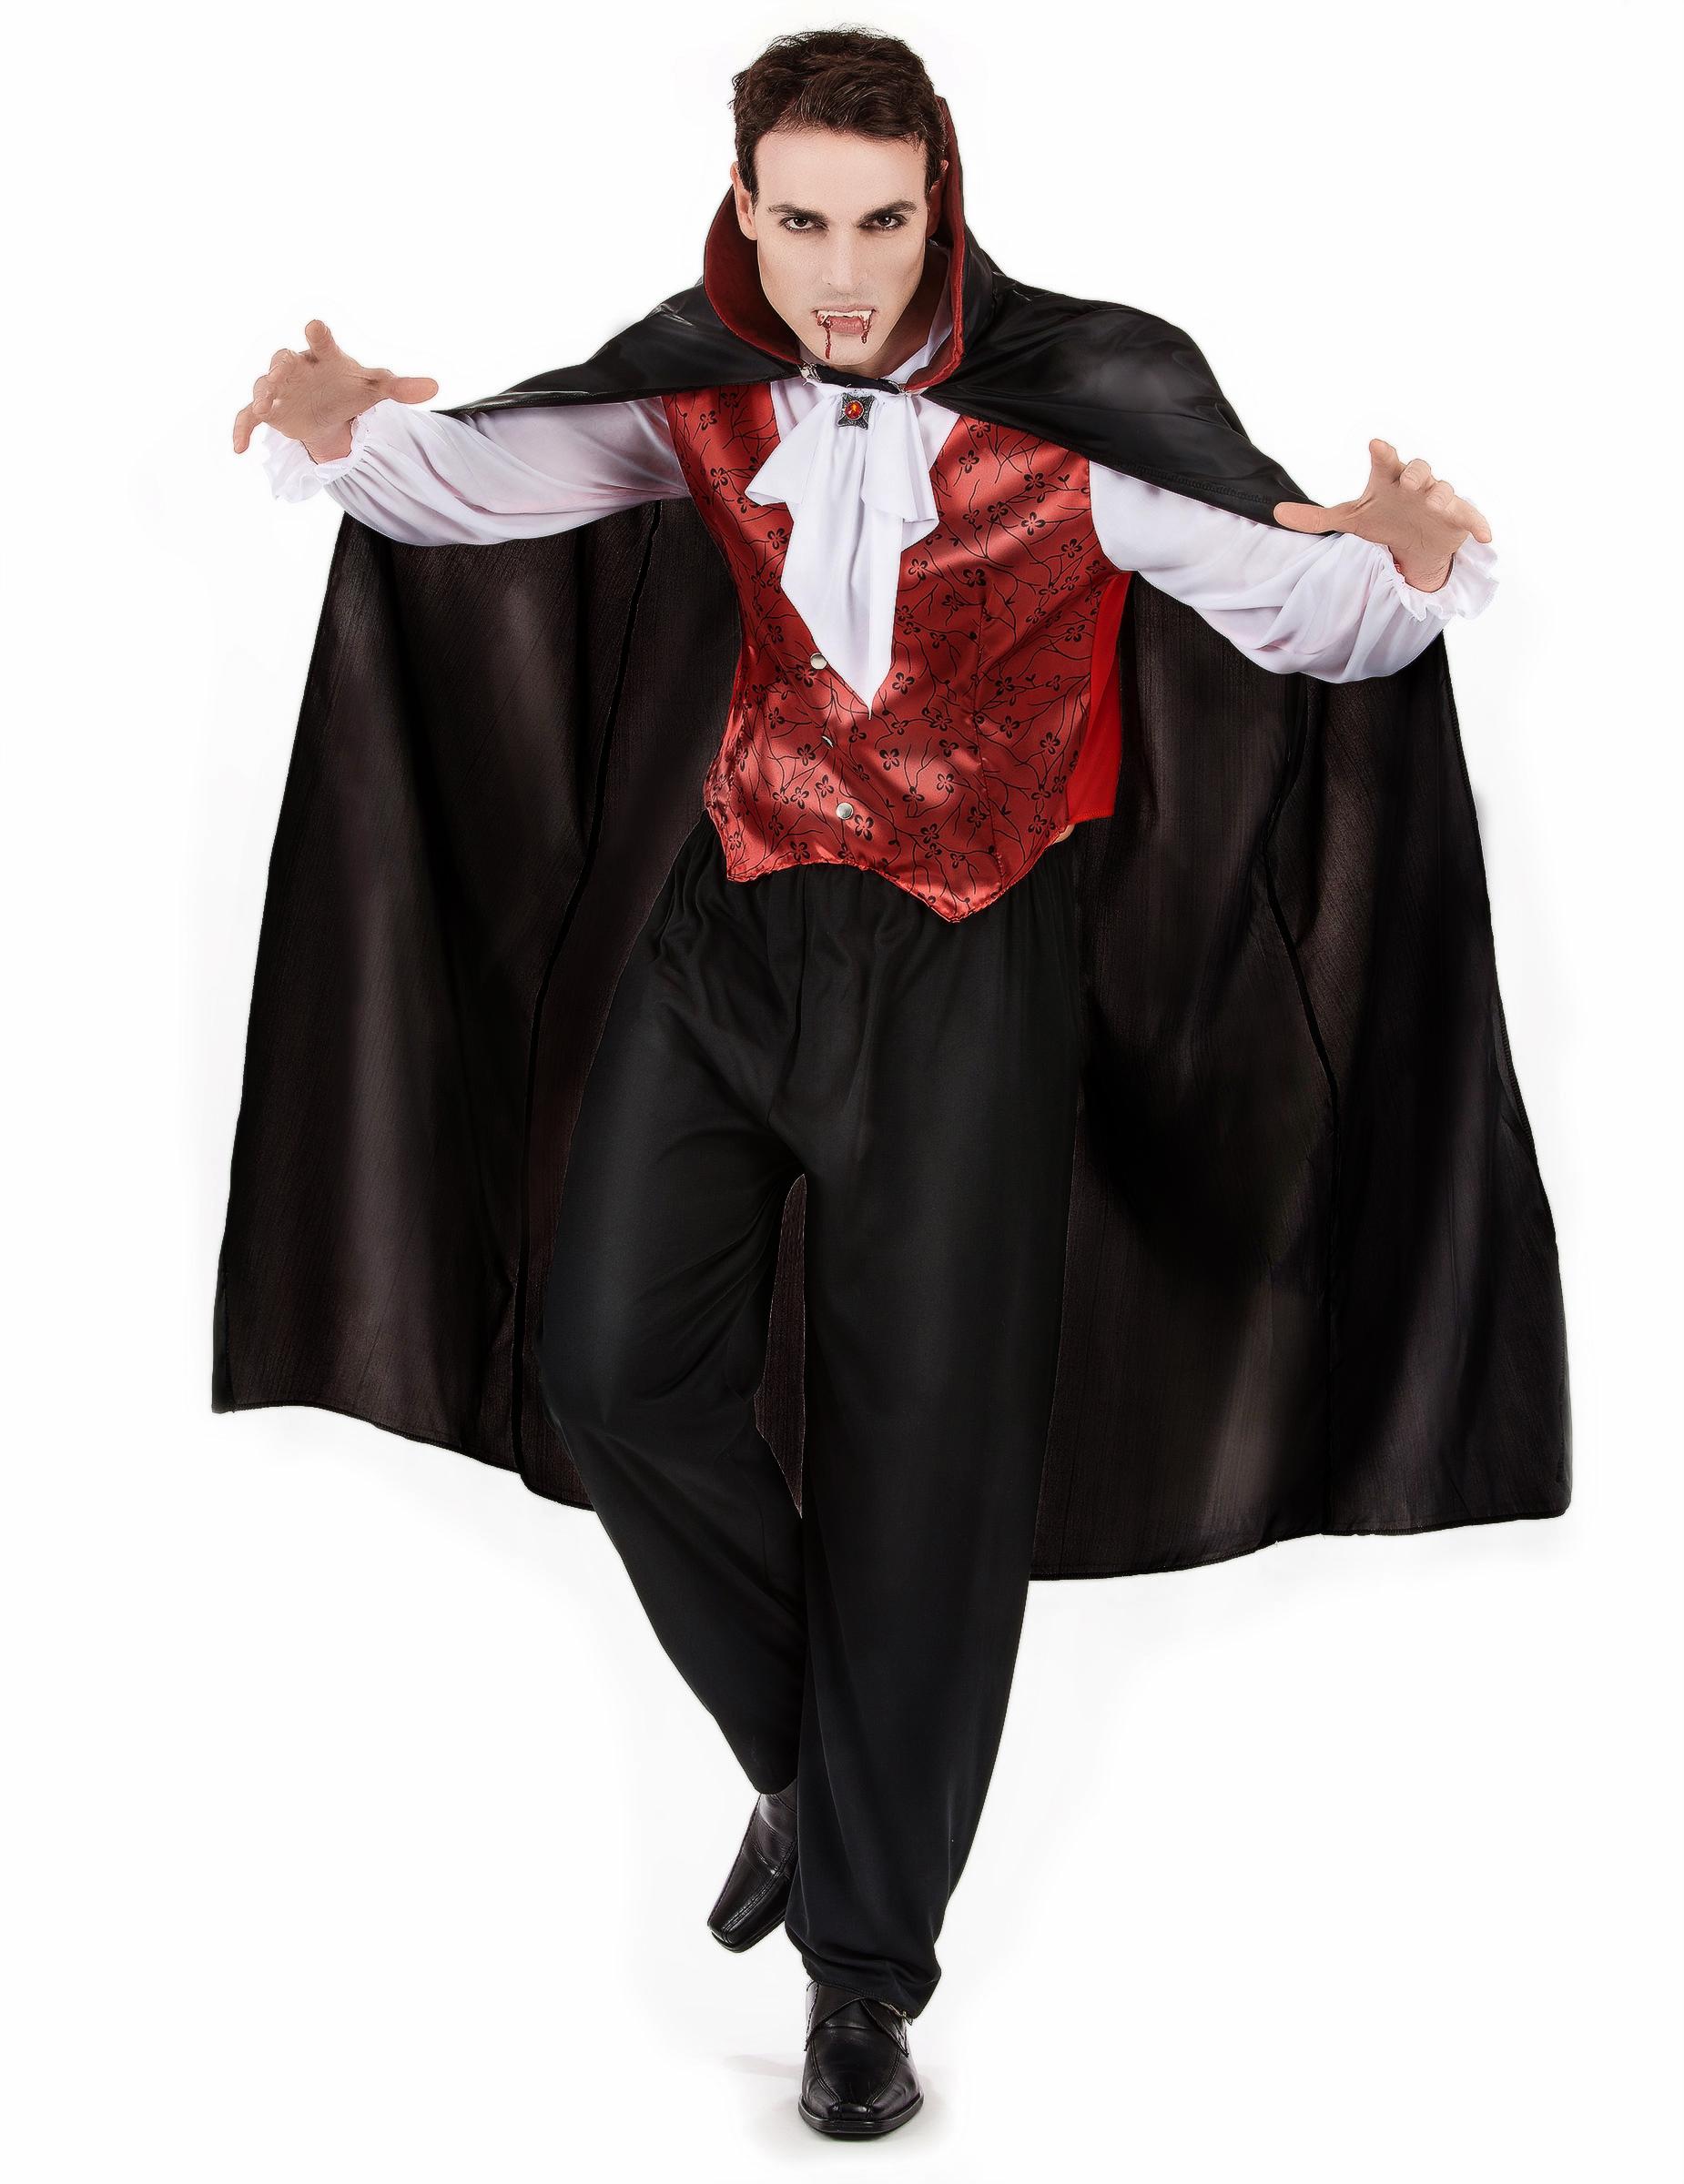 Travestimento da vampiro uomo per Halloween su VegaooParty 1f36aee9bd94